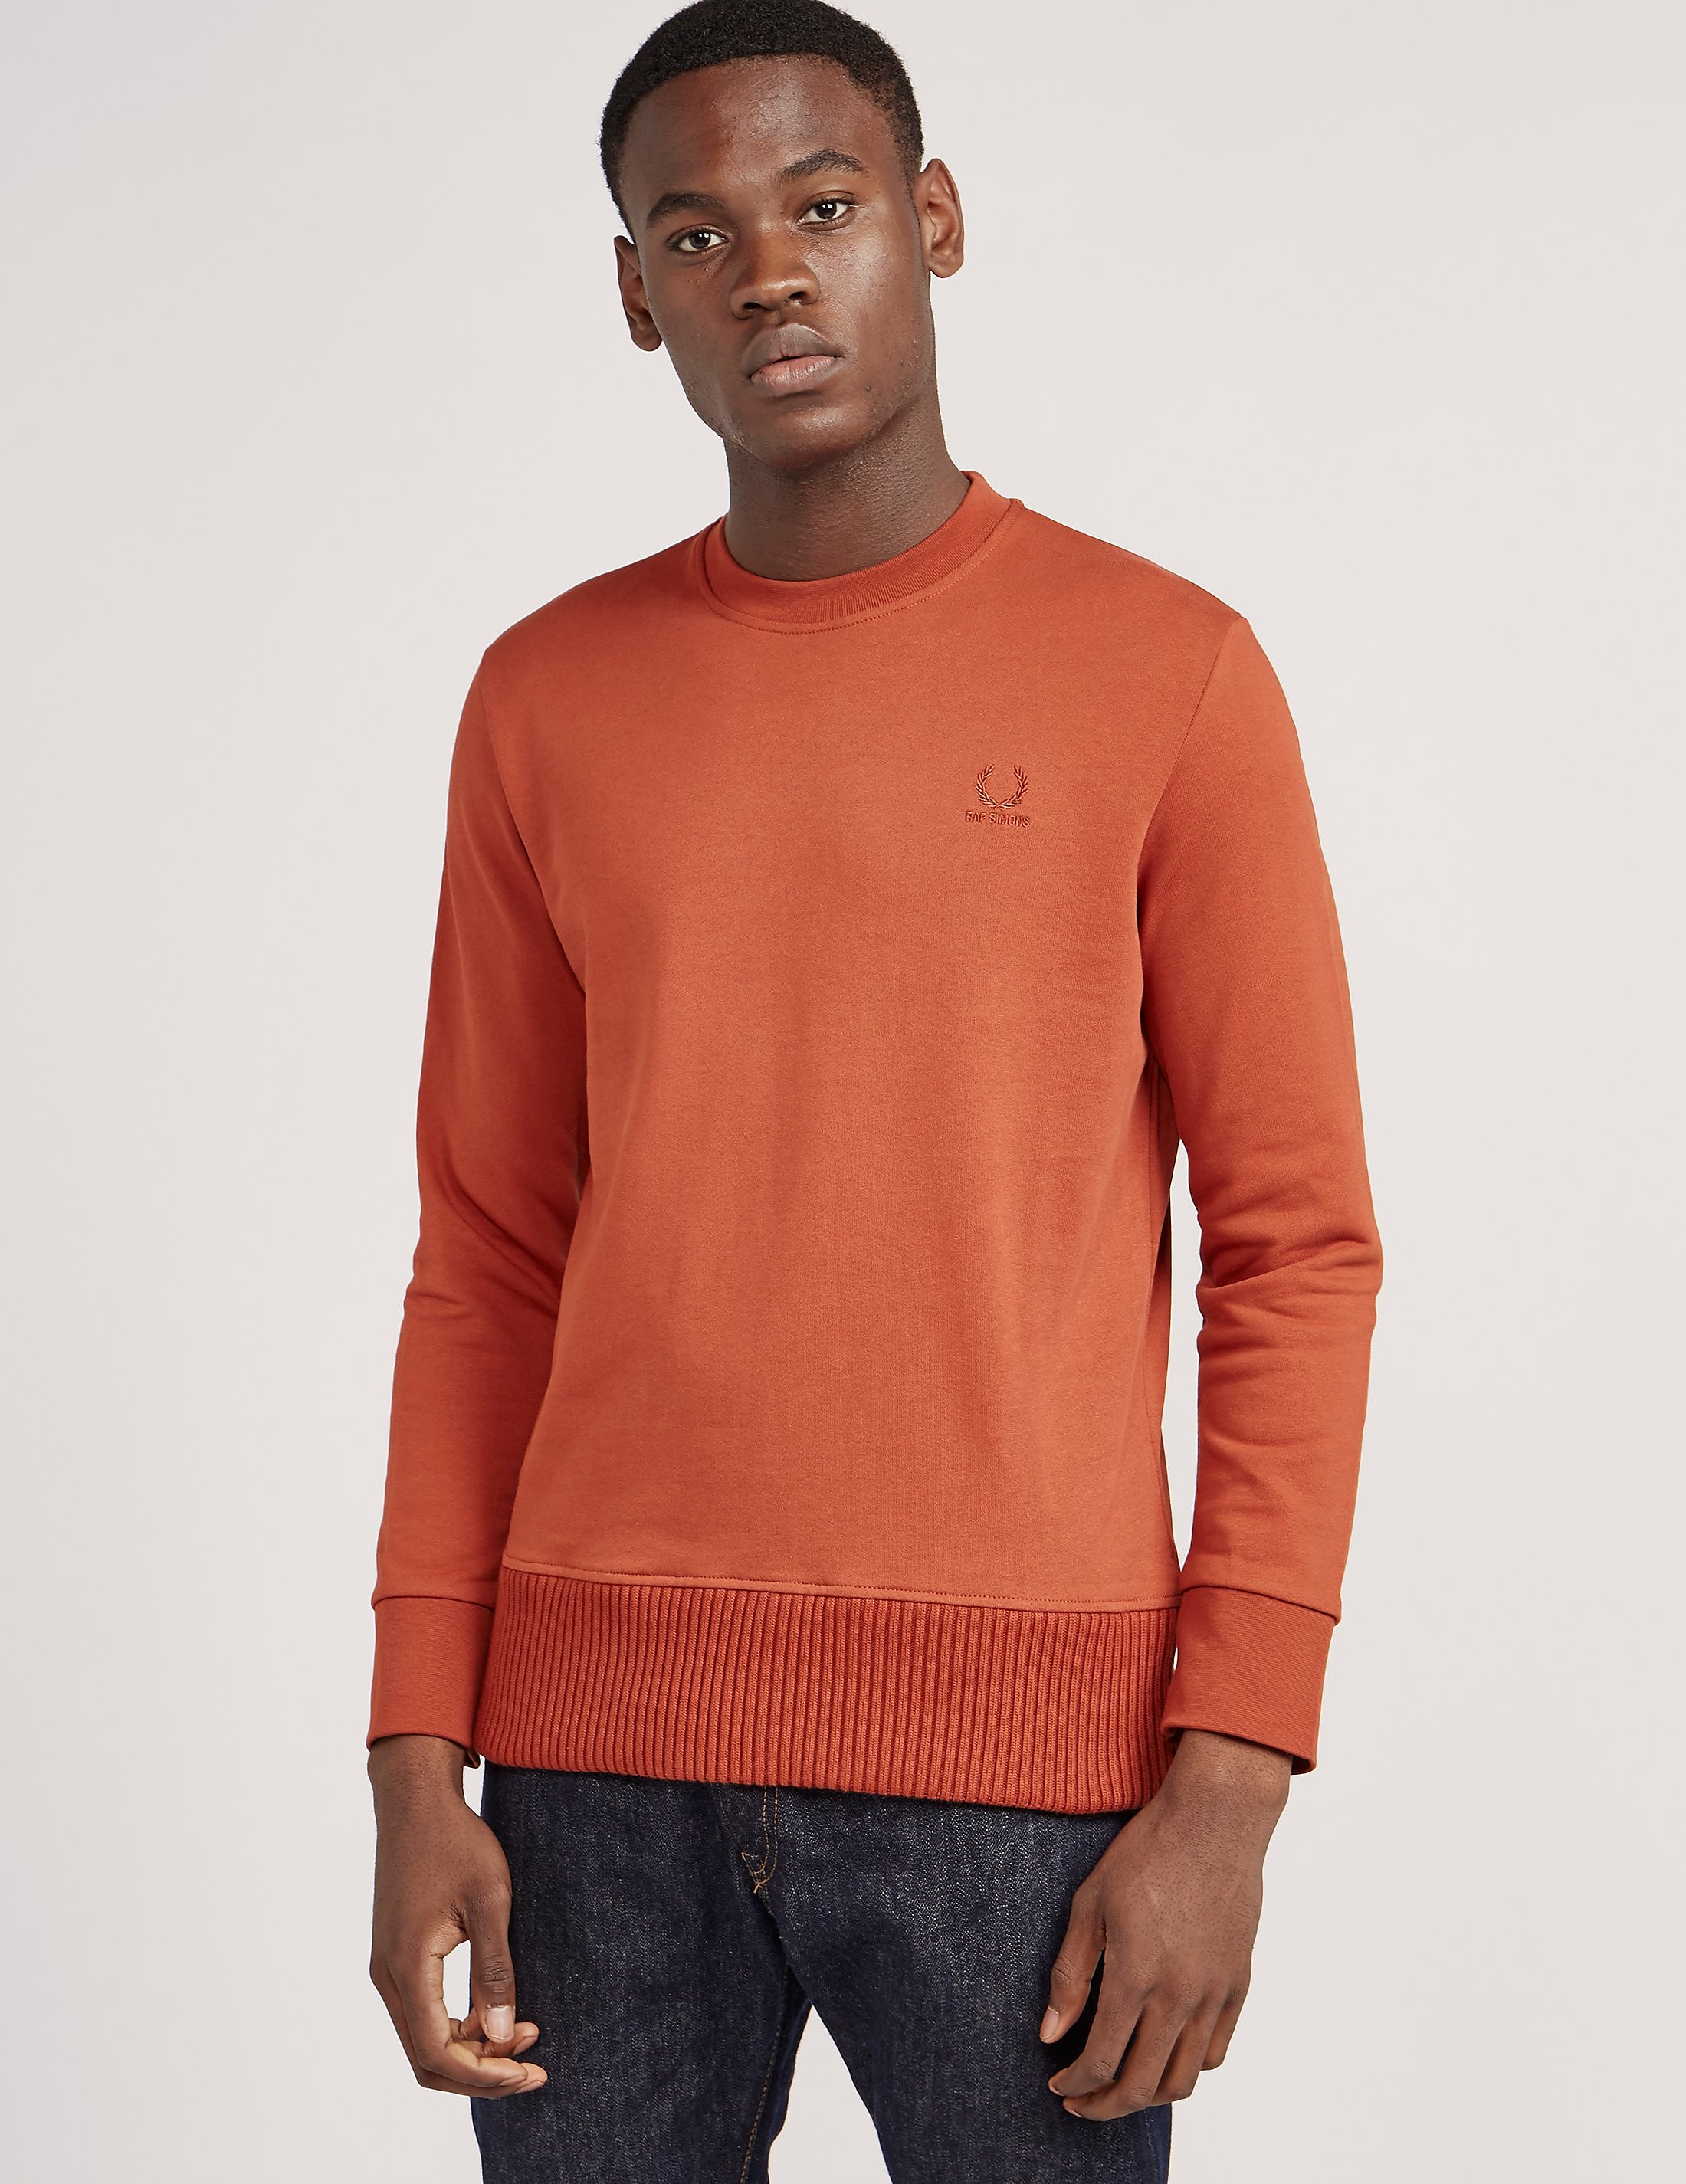 Fred Perry Raf Simons Crew Neck Sweatshirt